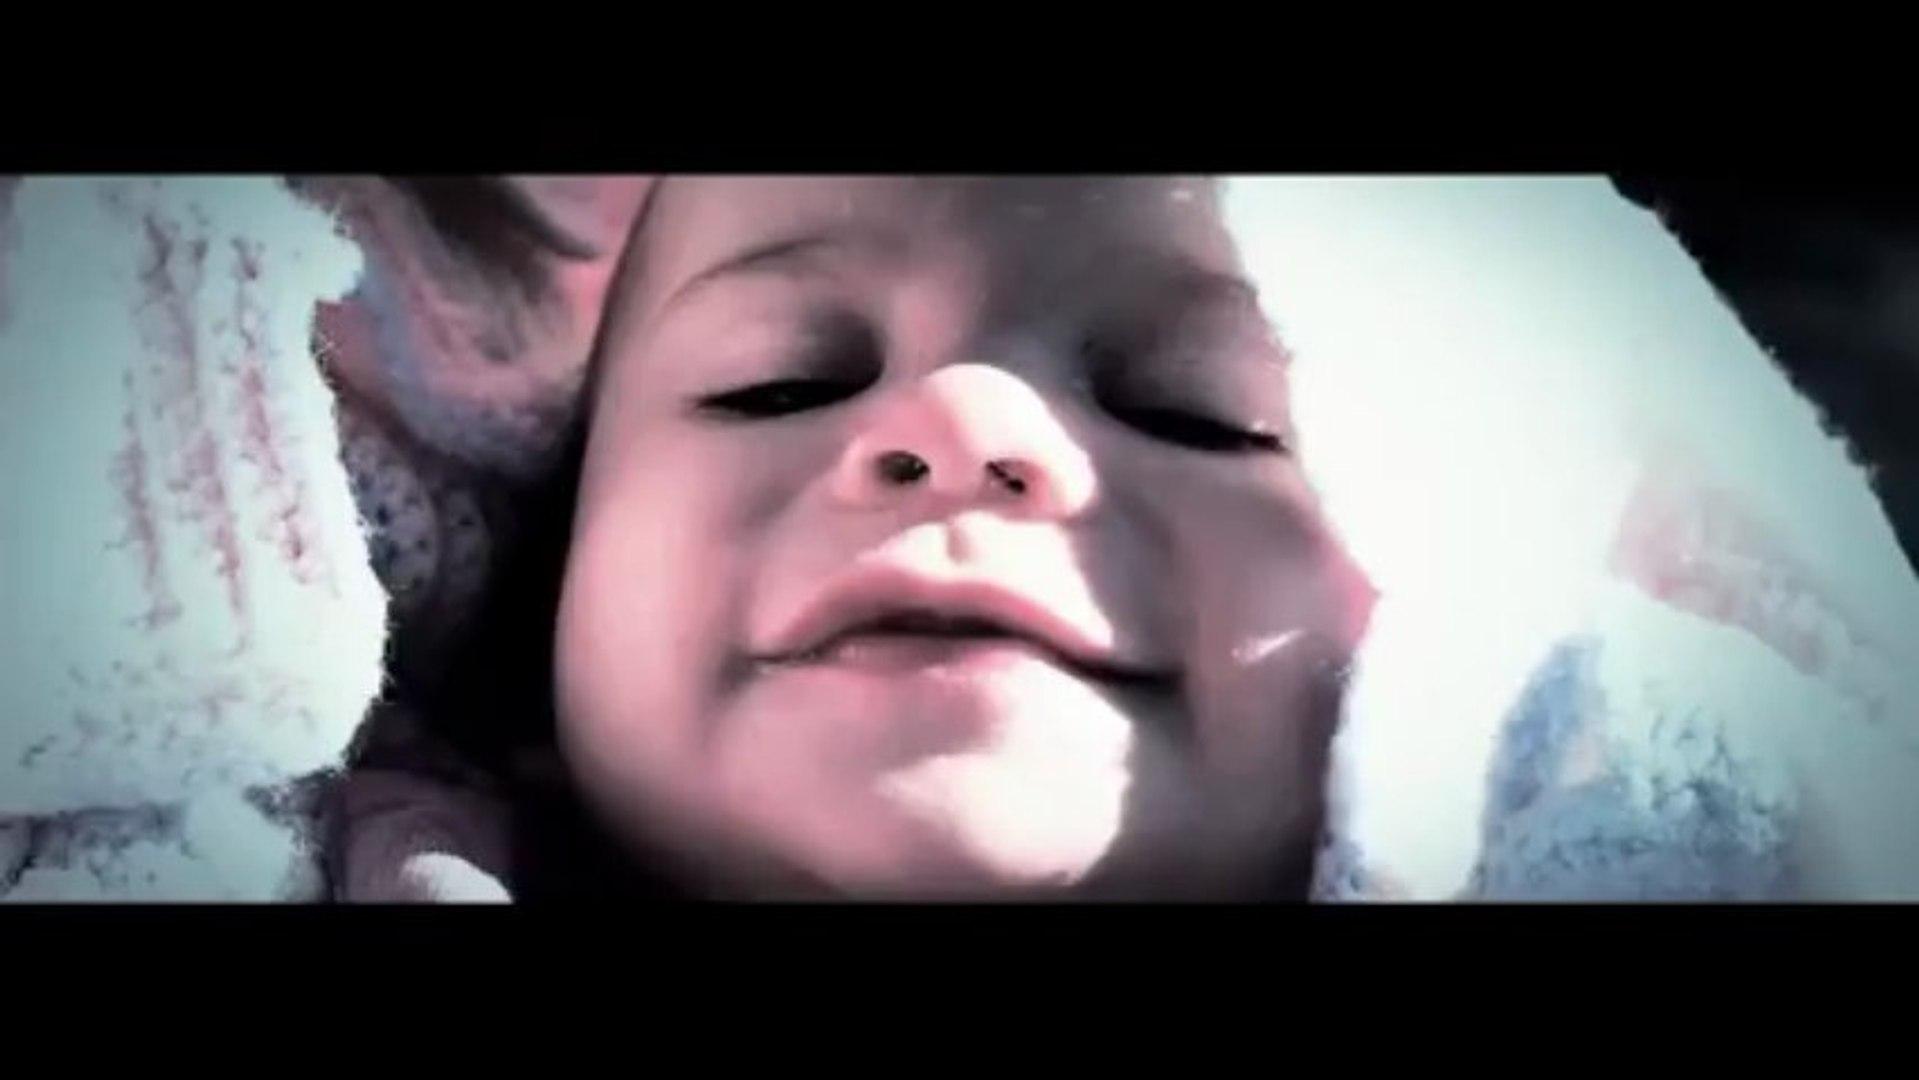 Coffin Baby (2013) Trailer HD